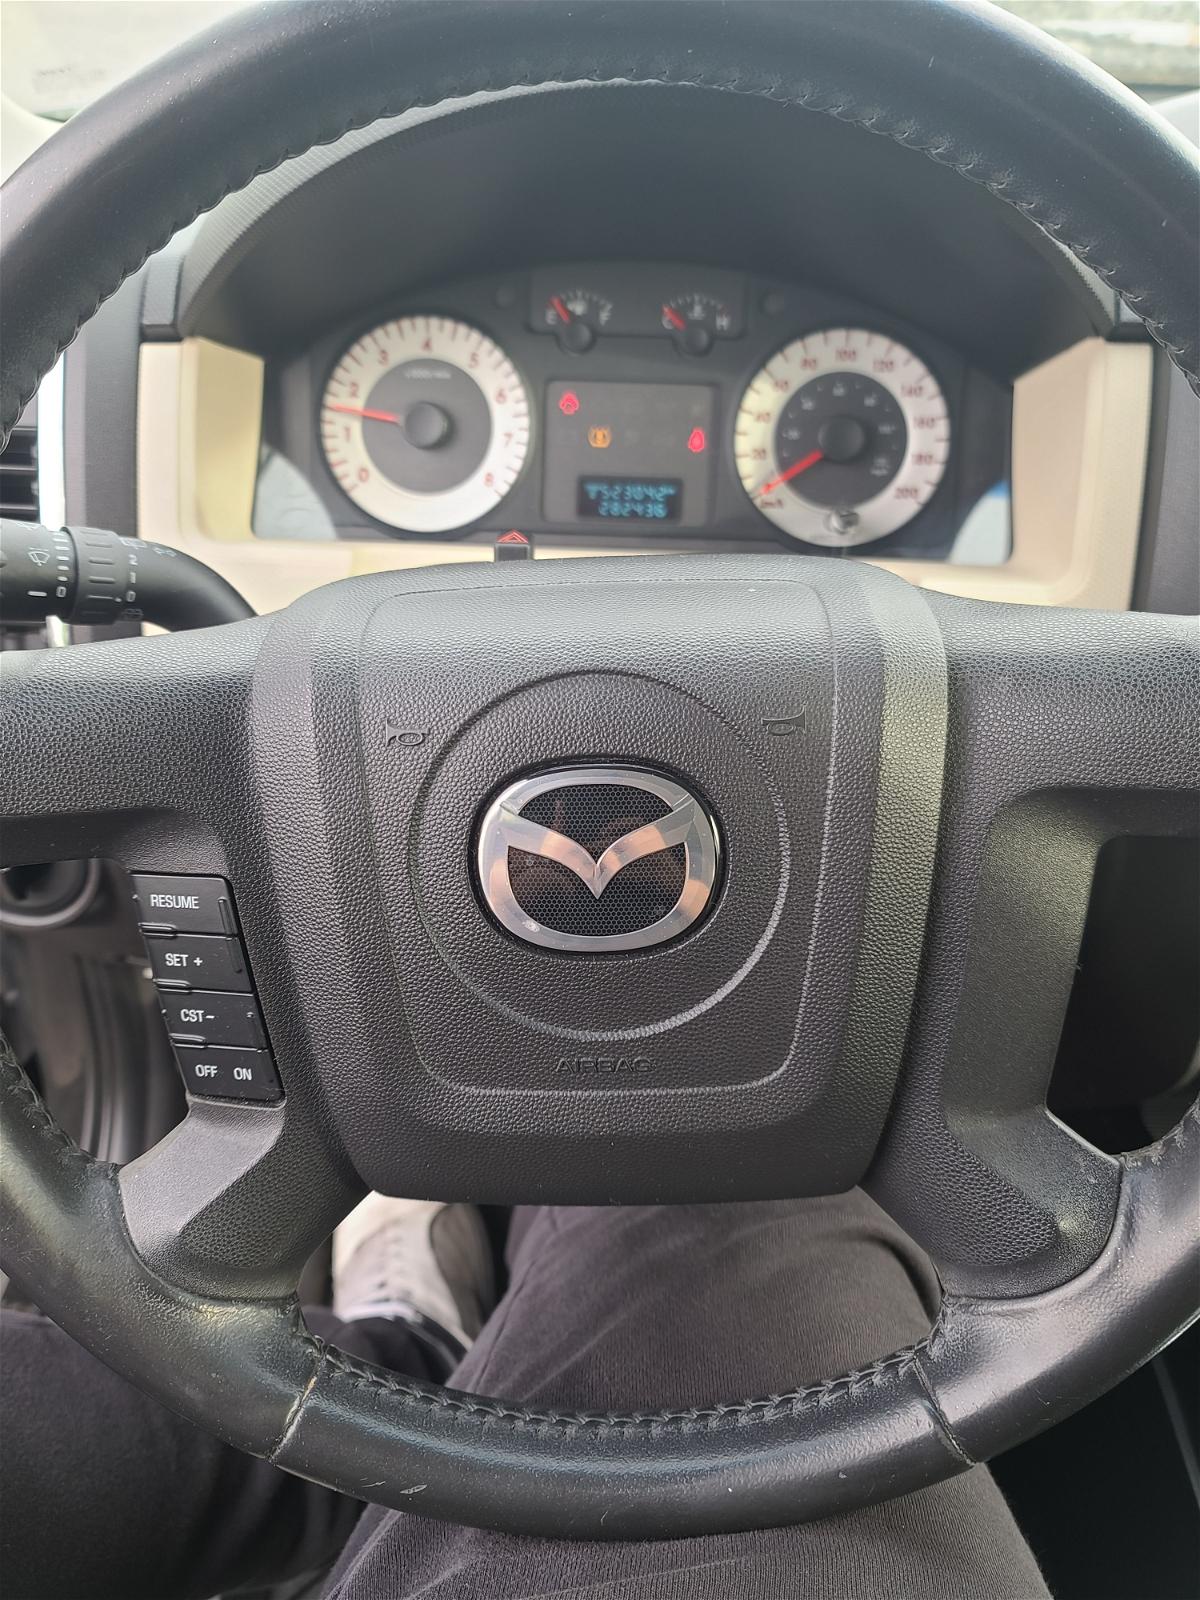 2008 - Mazda - Tribute - 4F2CZ06168KM01605